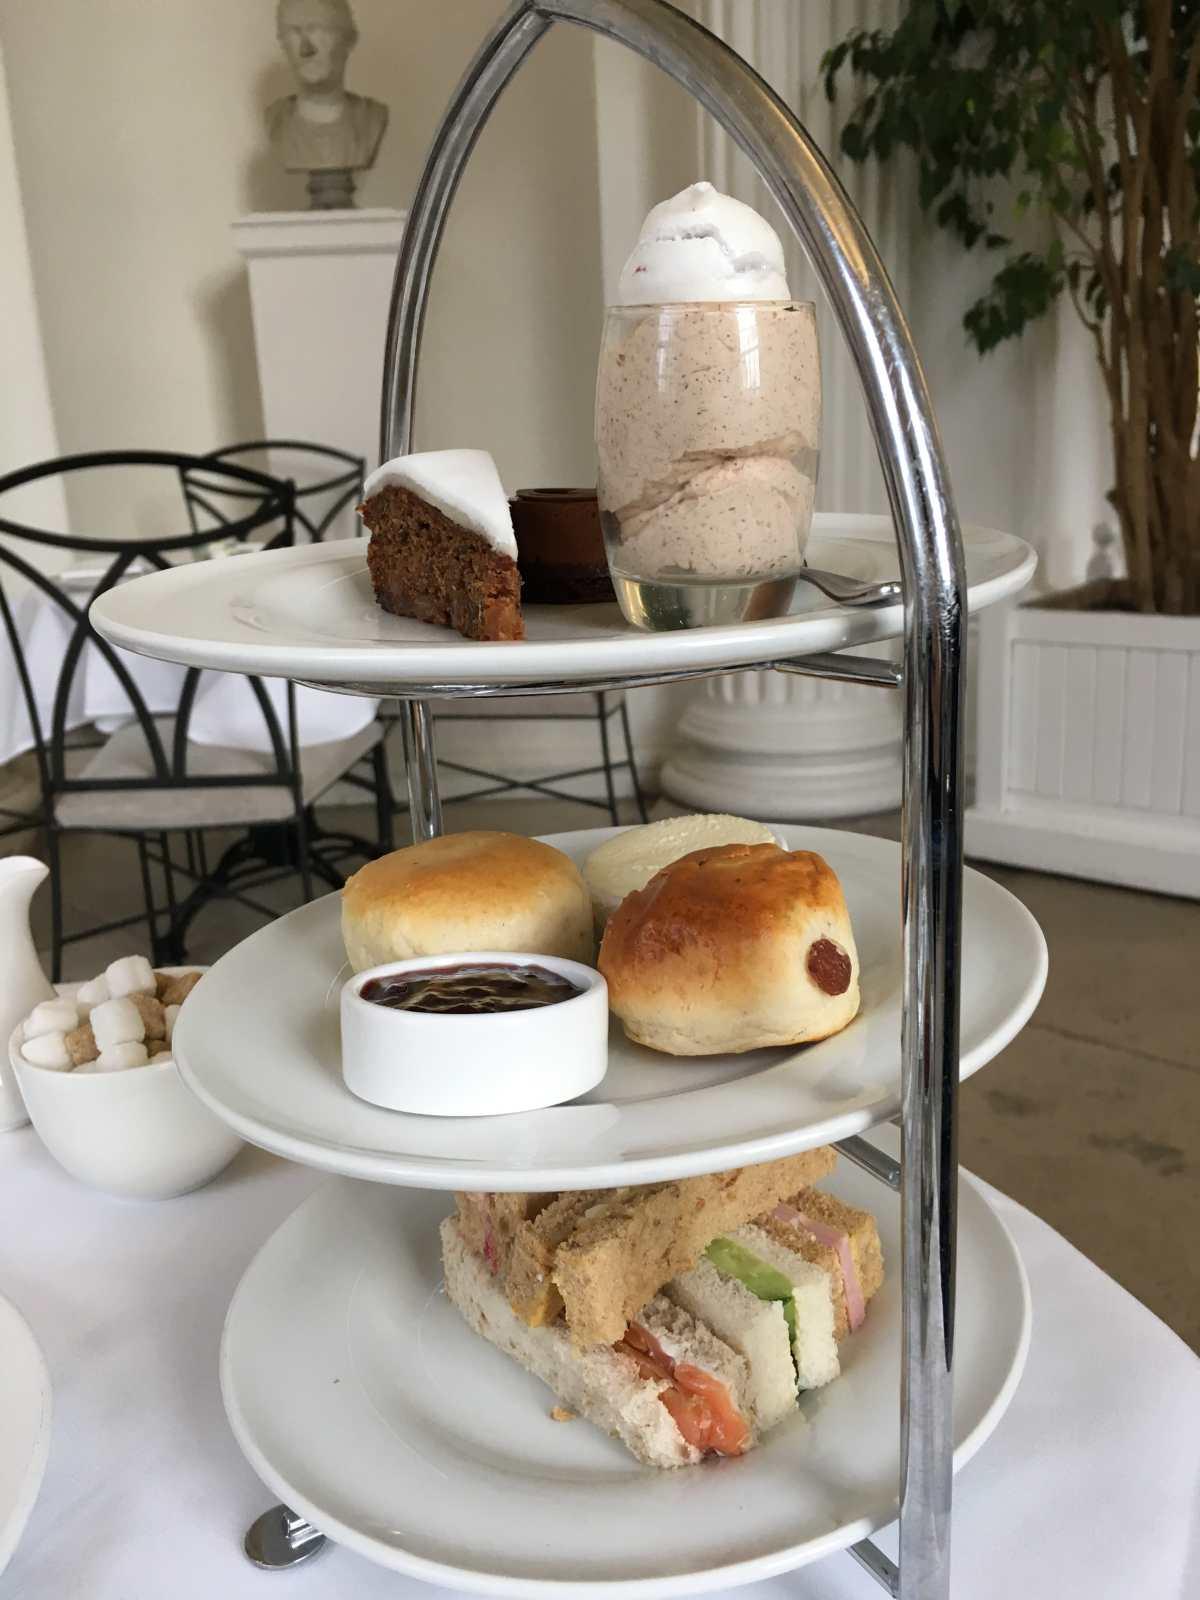 Afternoon tea, pastries, the Orangery, Kensington gardens, LondonAfternoon tea, pastries, the Orangery, Kensington gardens, London